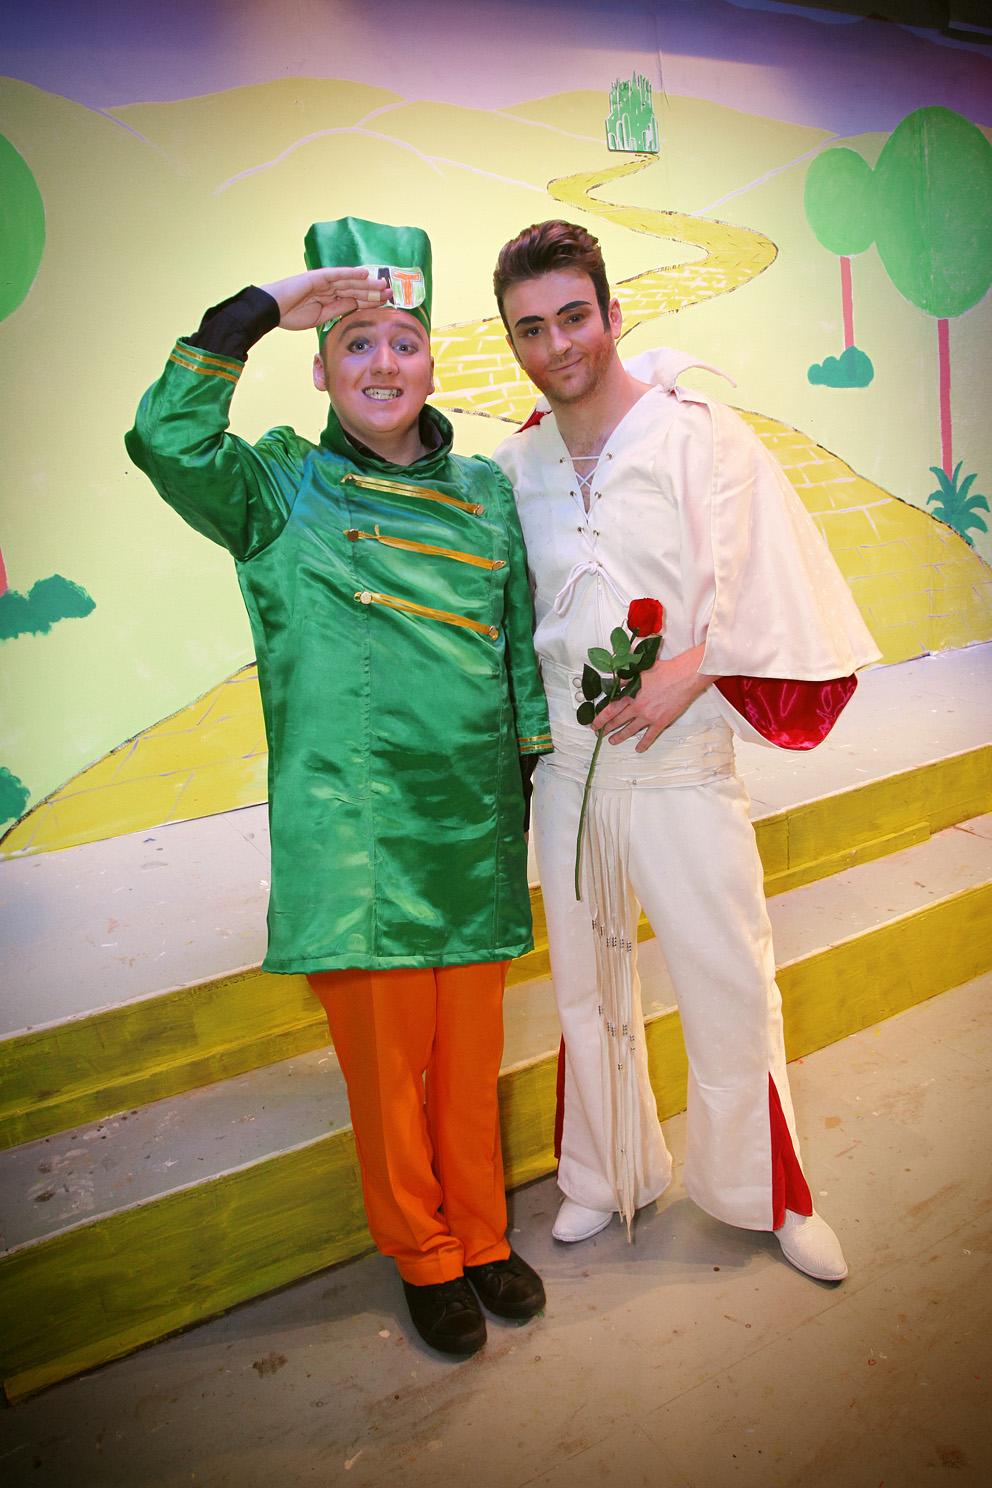 07.Wizard of OZ and Gaurd